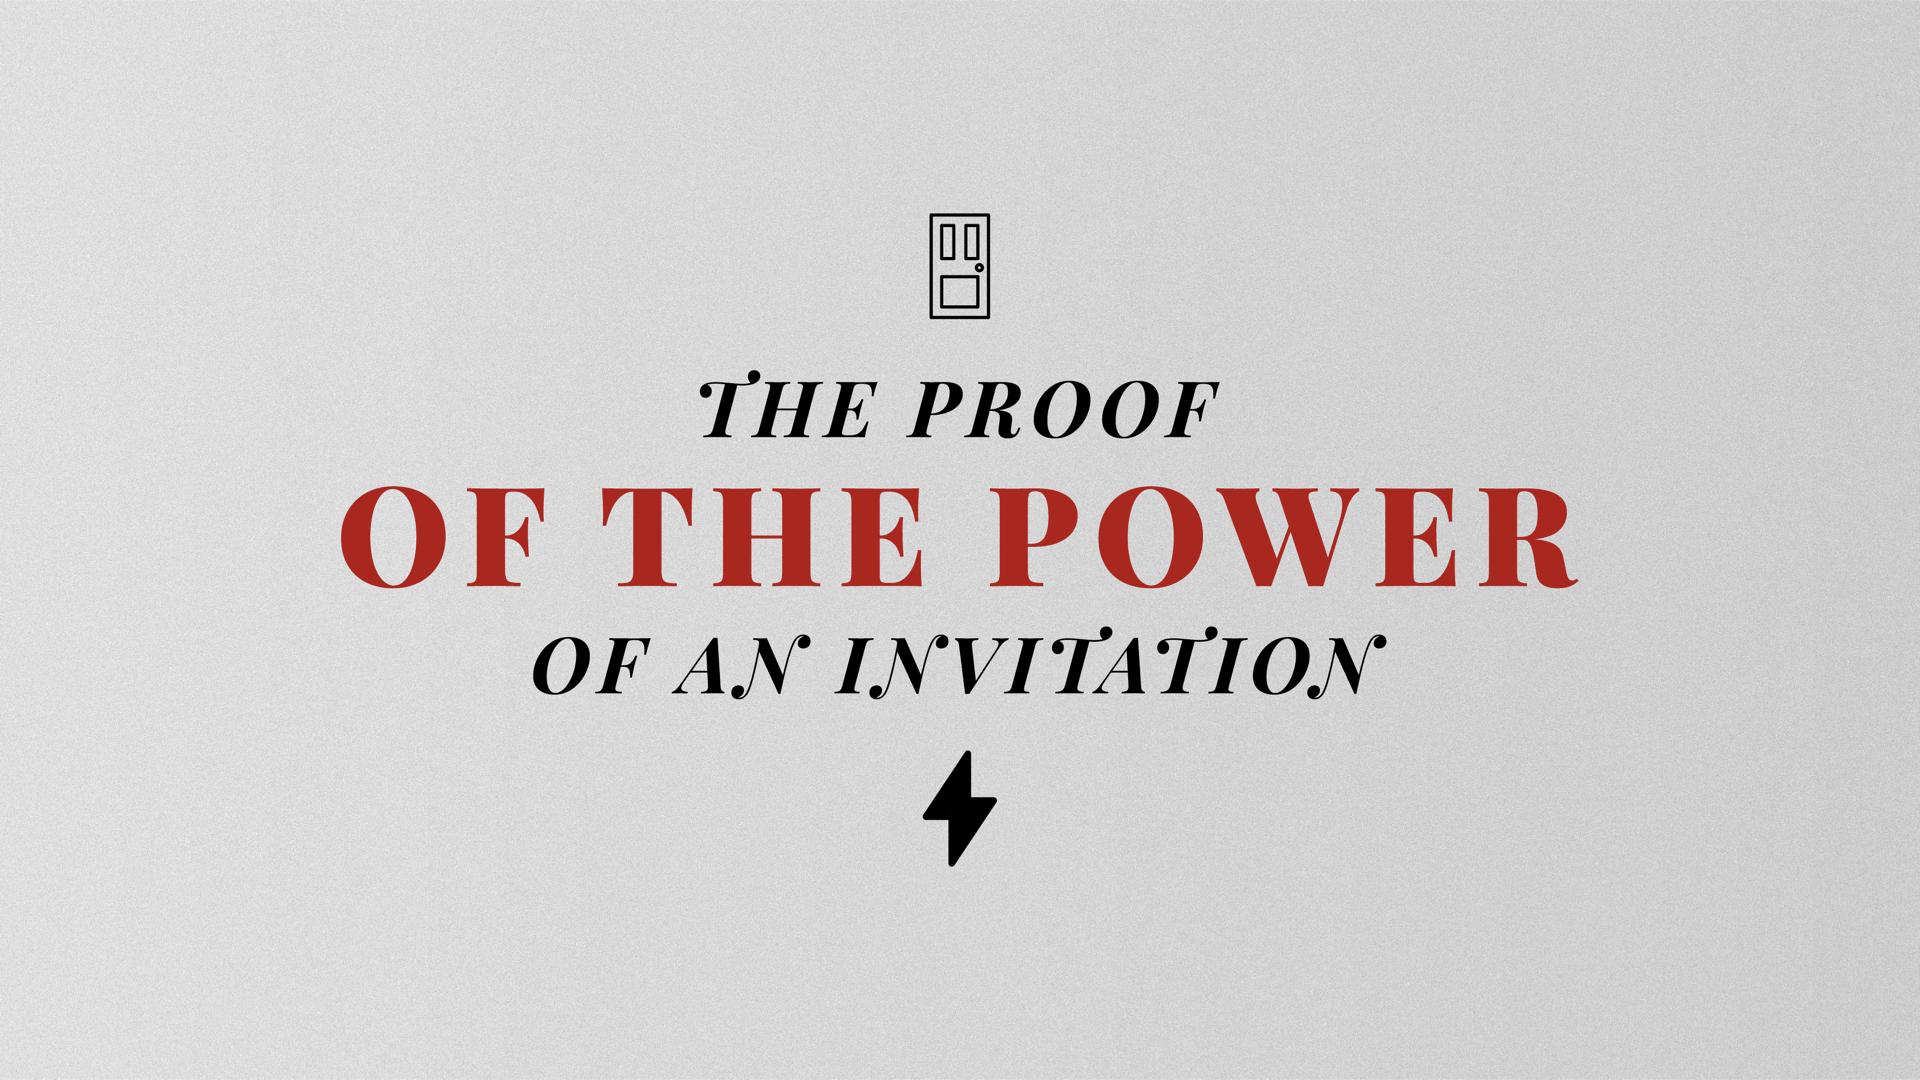 02.25.18 - PROOF OF POWER.002.jpeg